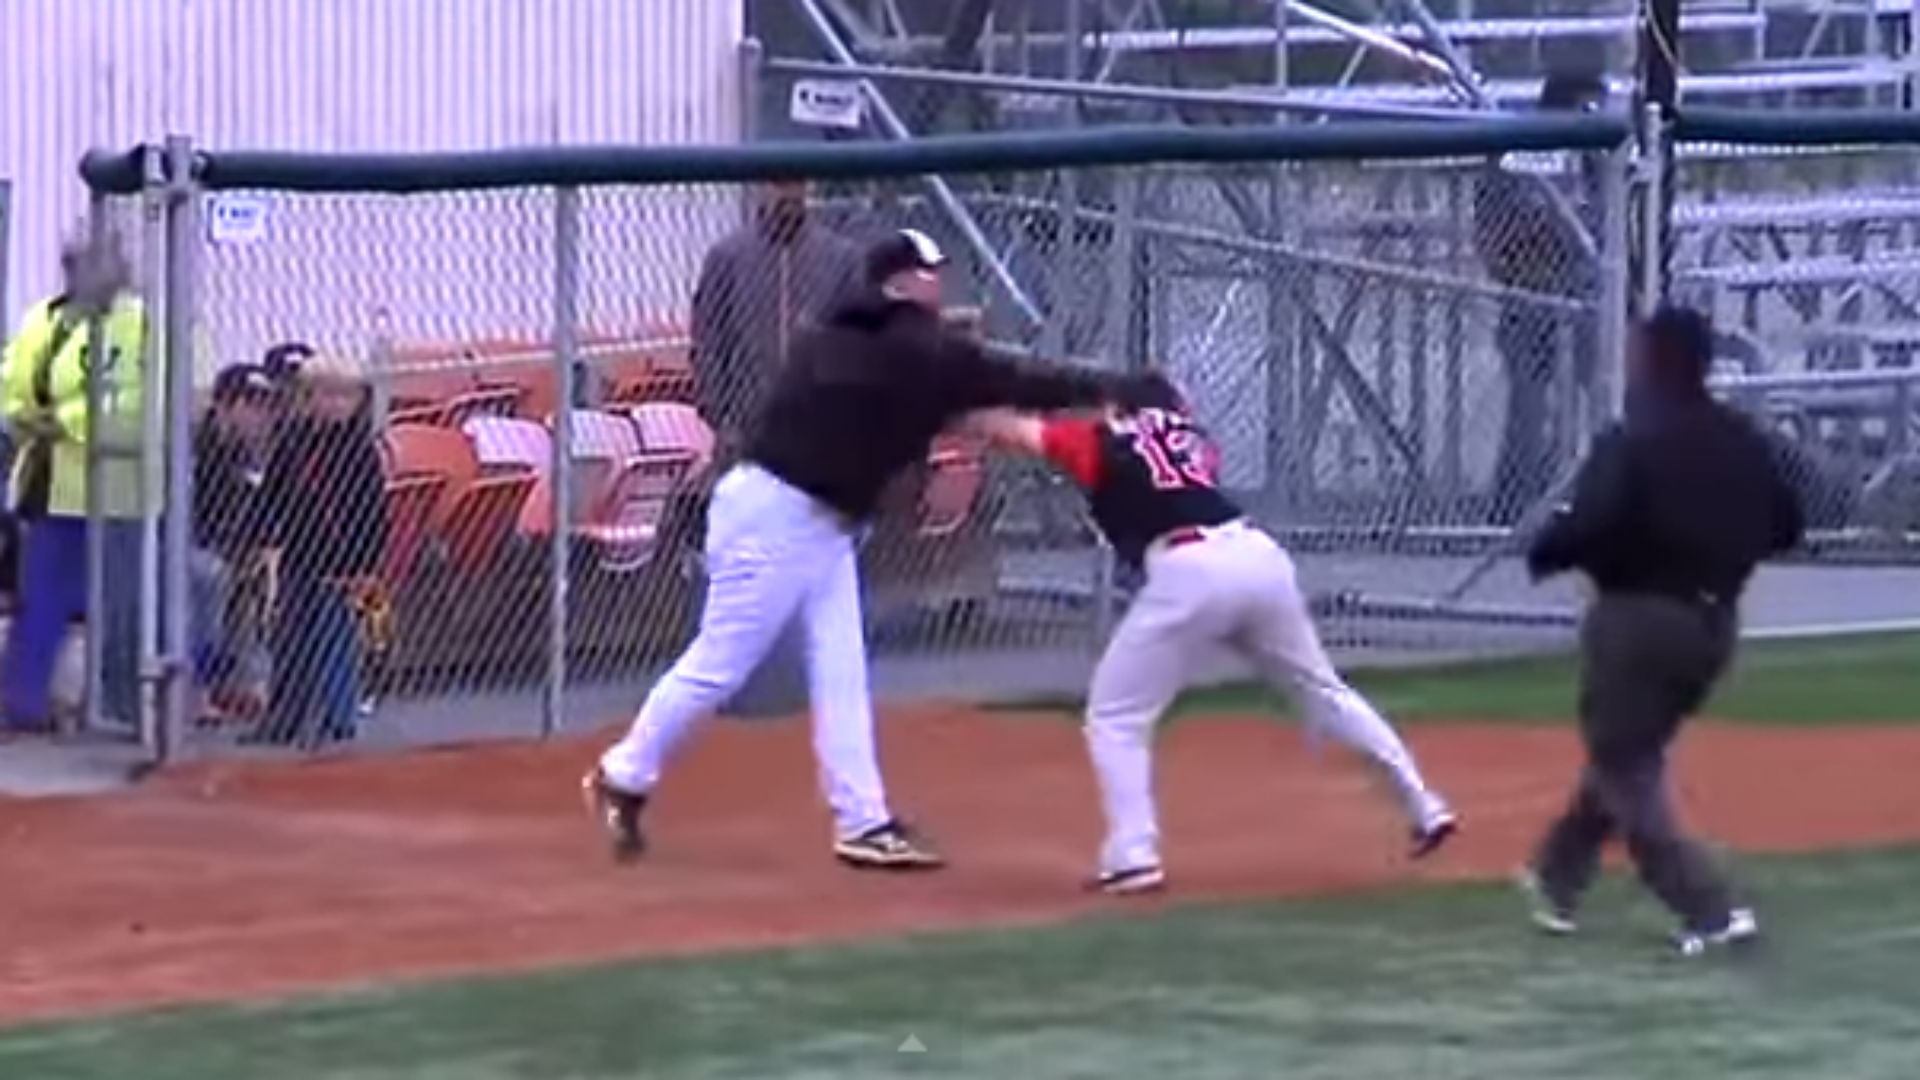 alaska-baseball-fight-ftr-071015.jpg